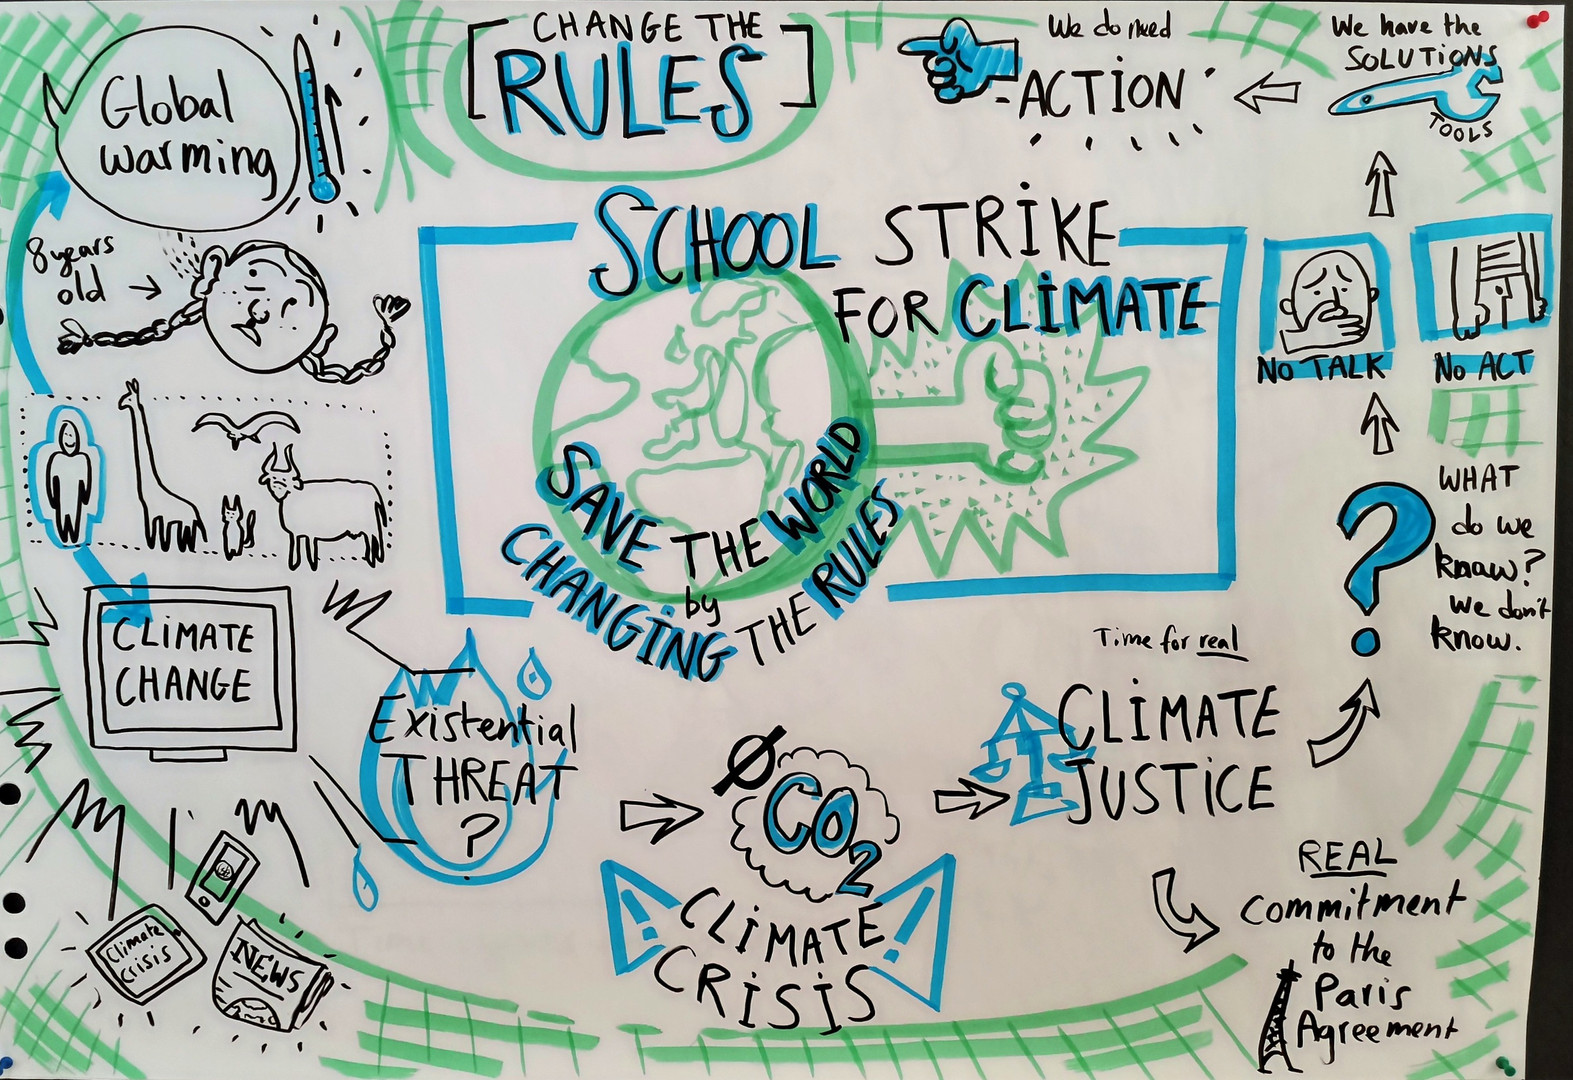 Greta Thunberg - change the rules